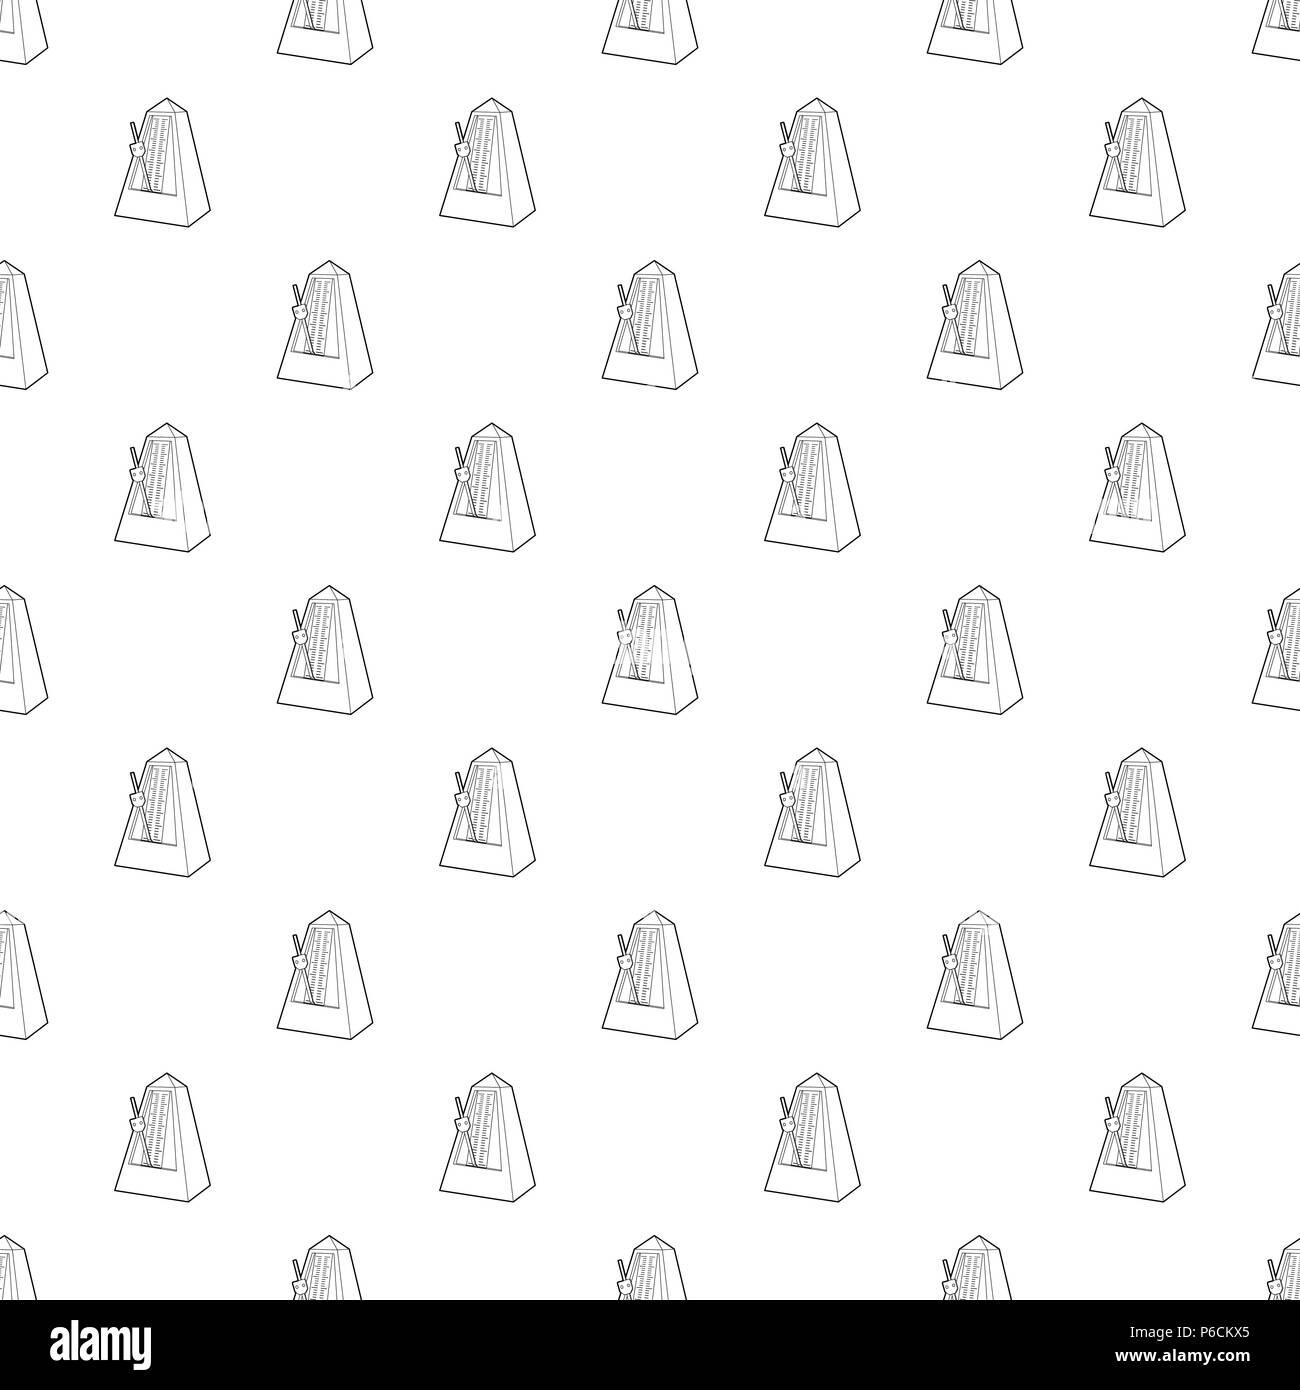 Metronome icon, outline style - Stock Image